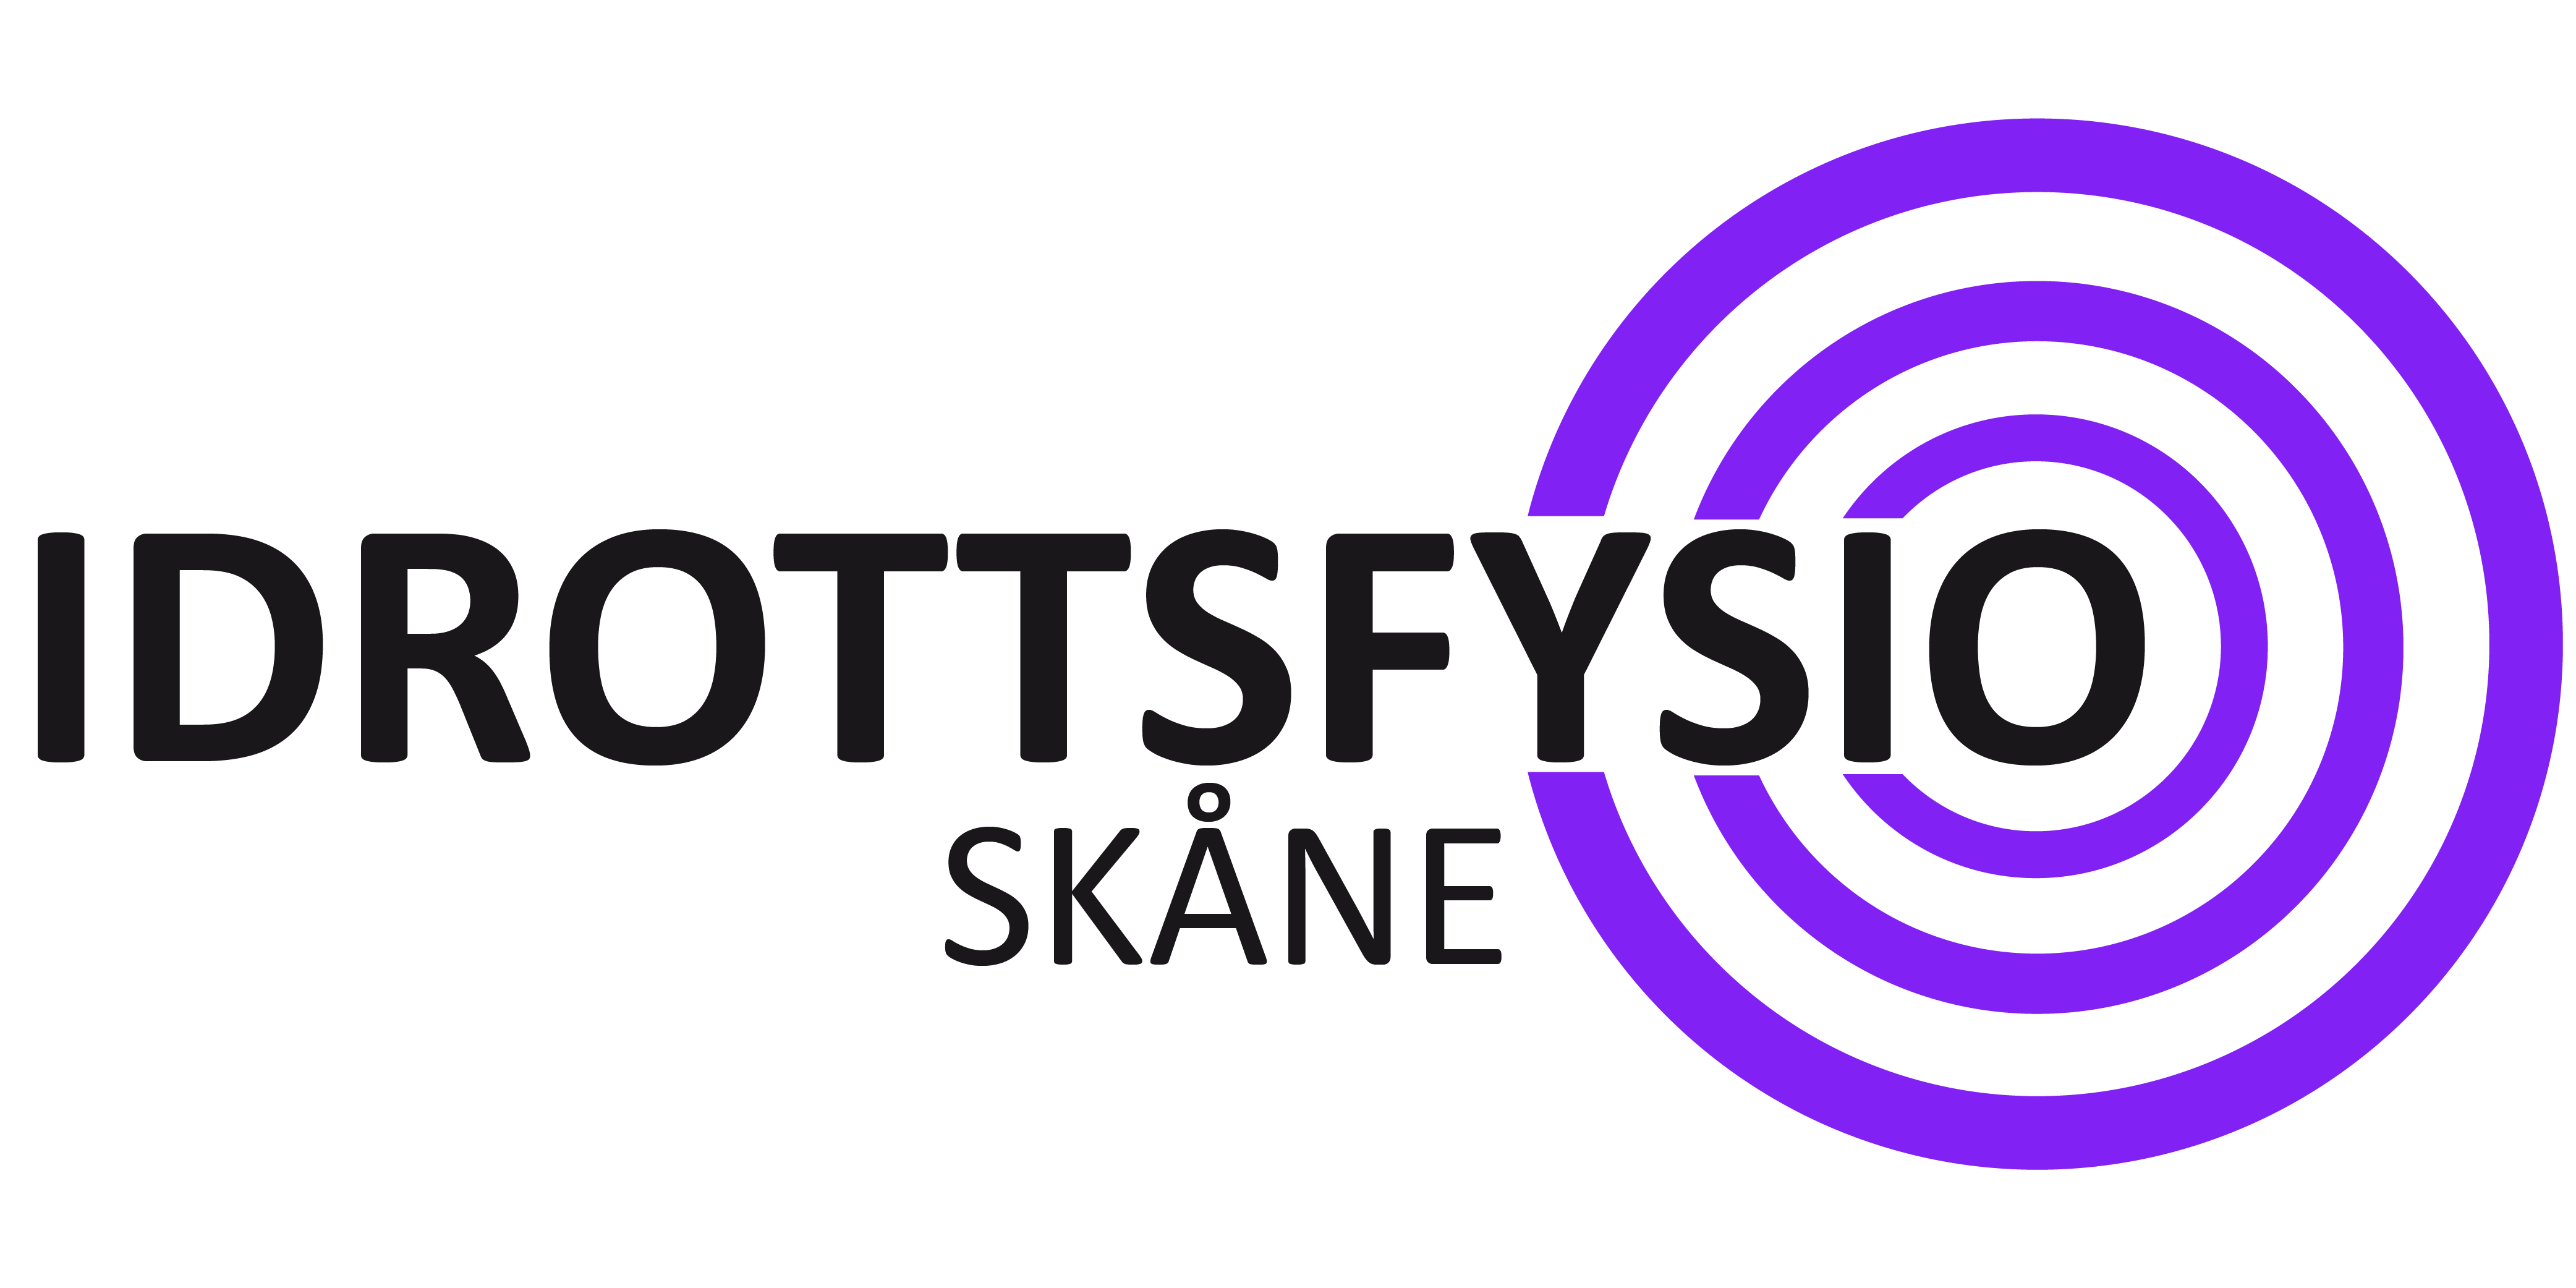 Idrottsfysio Skåne